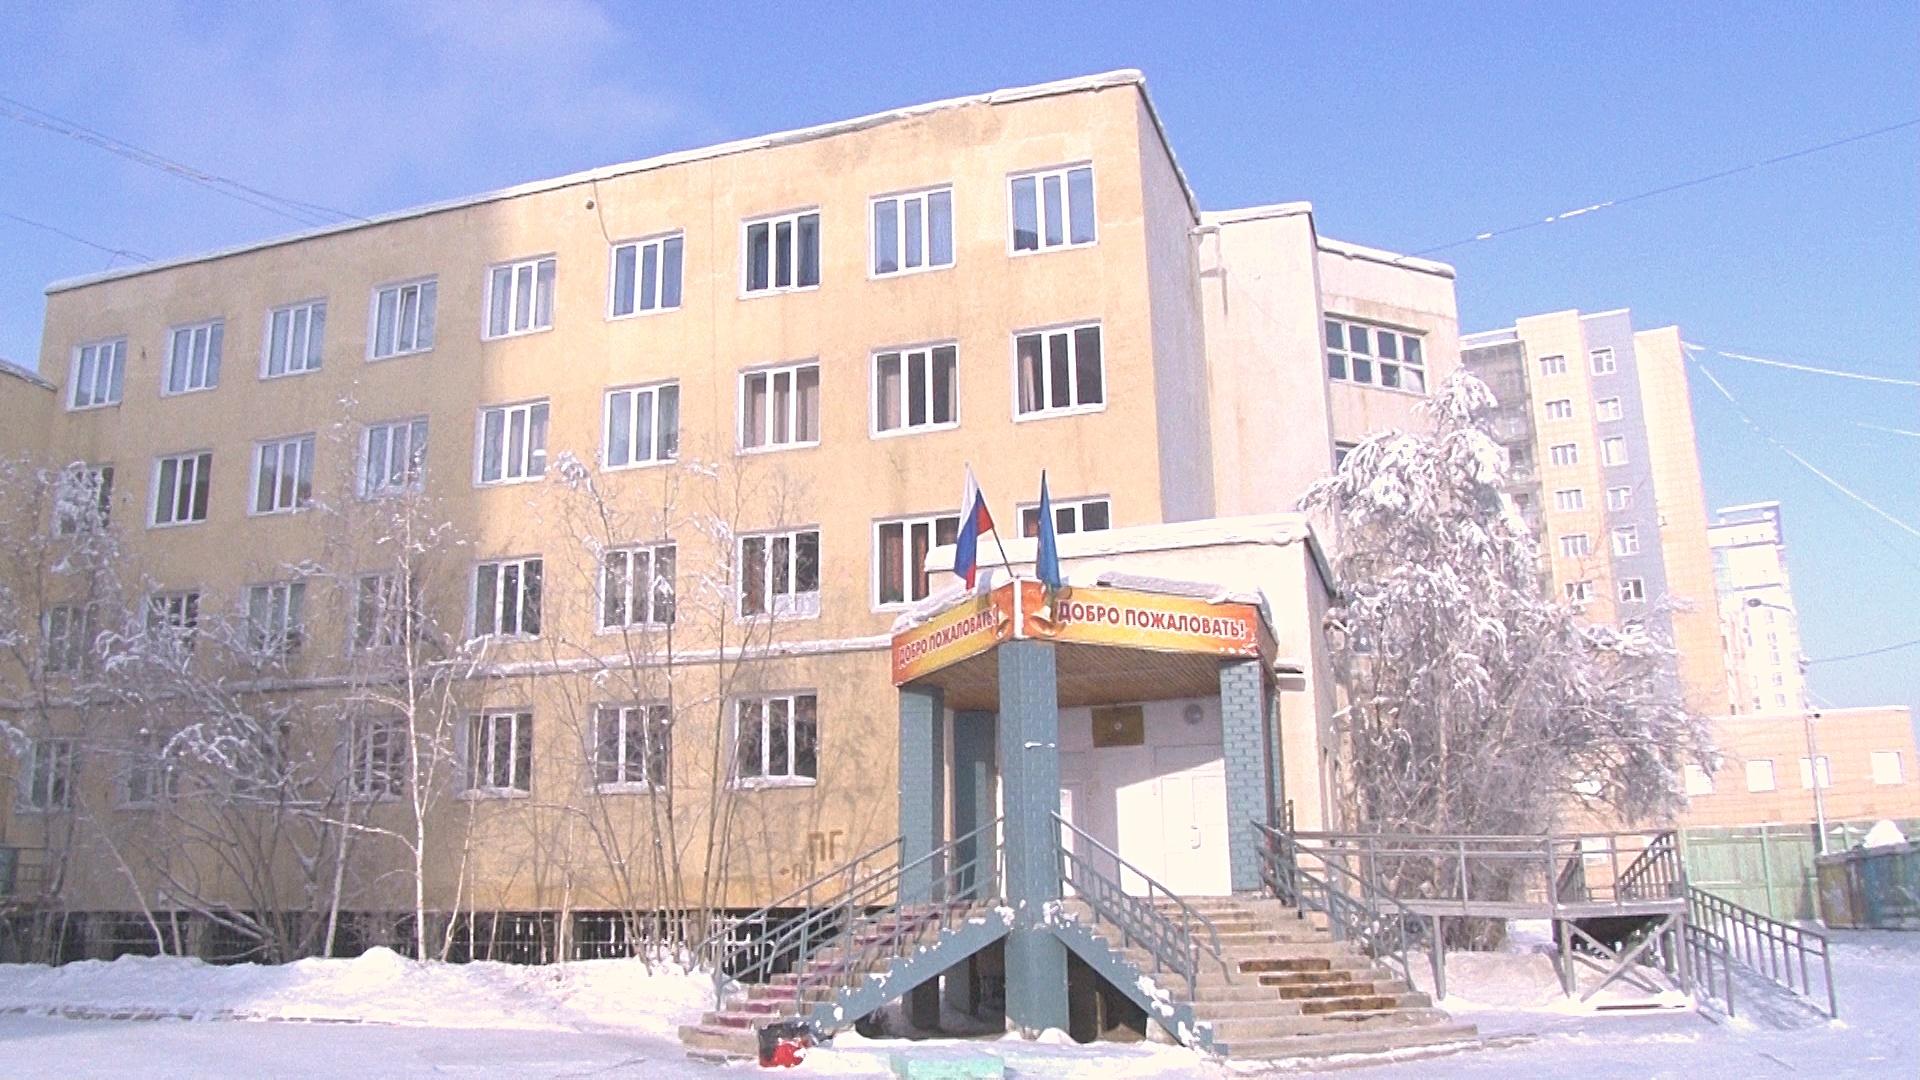 Видеорепортаж: О дистанционном формате обучения и жажде знаний в школе №3 Якутска